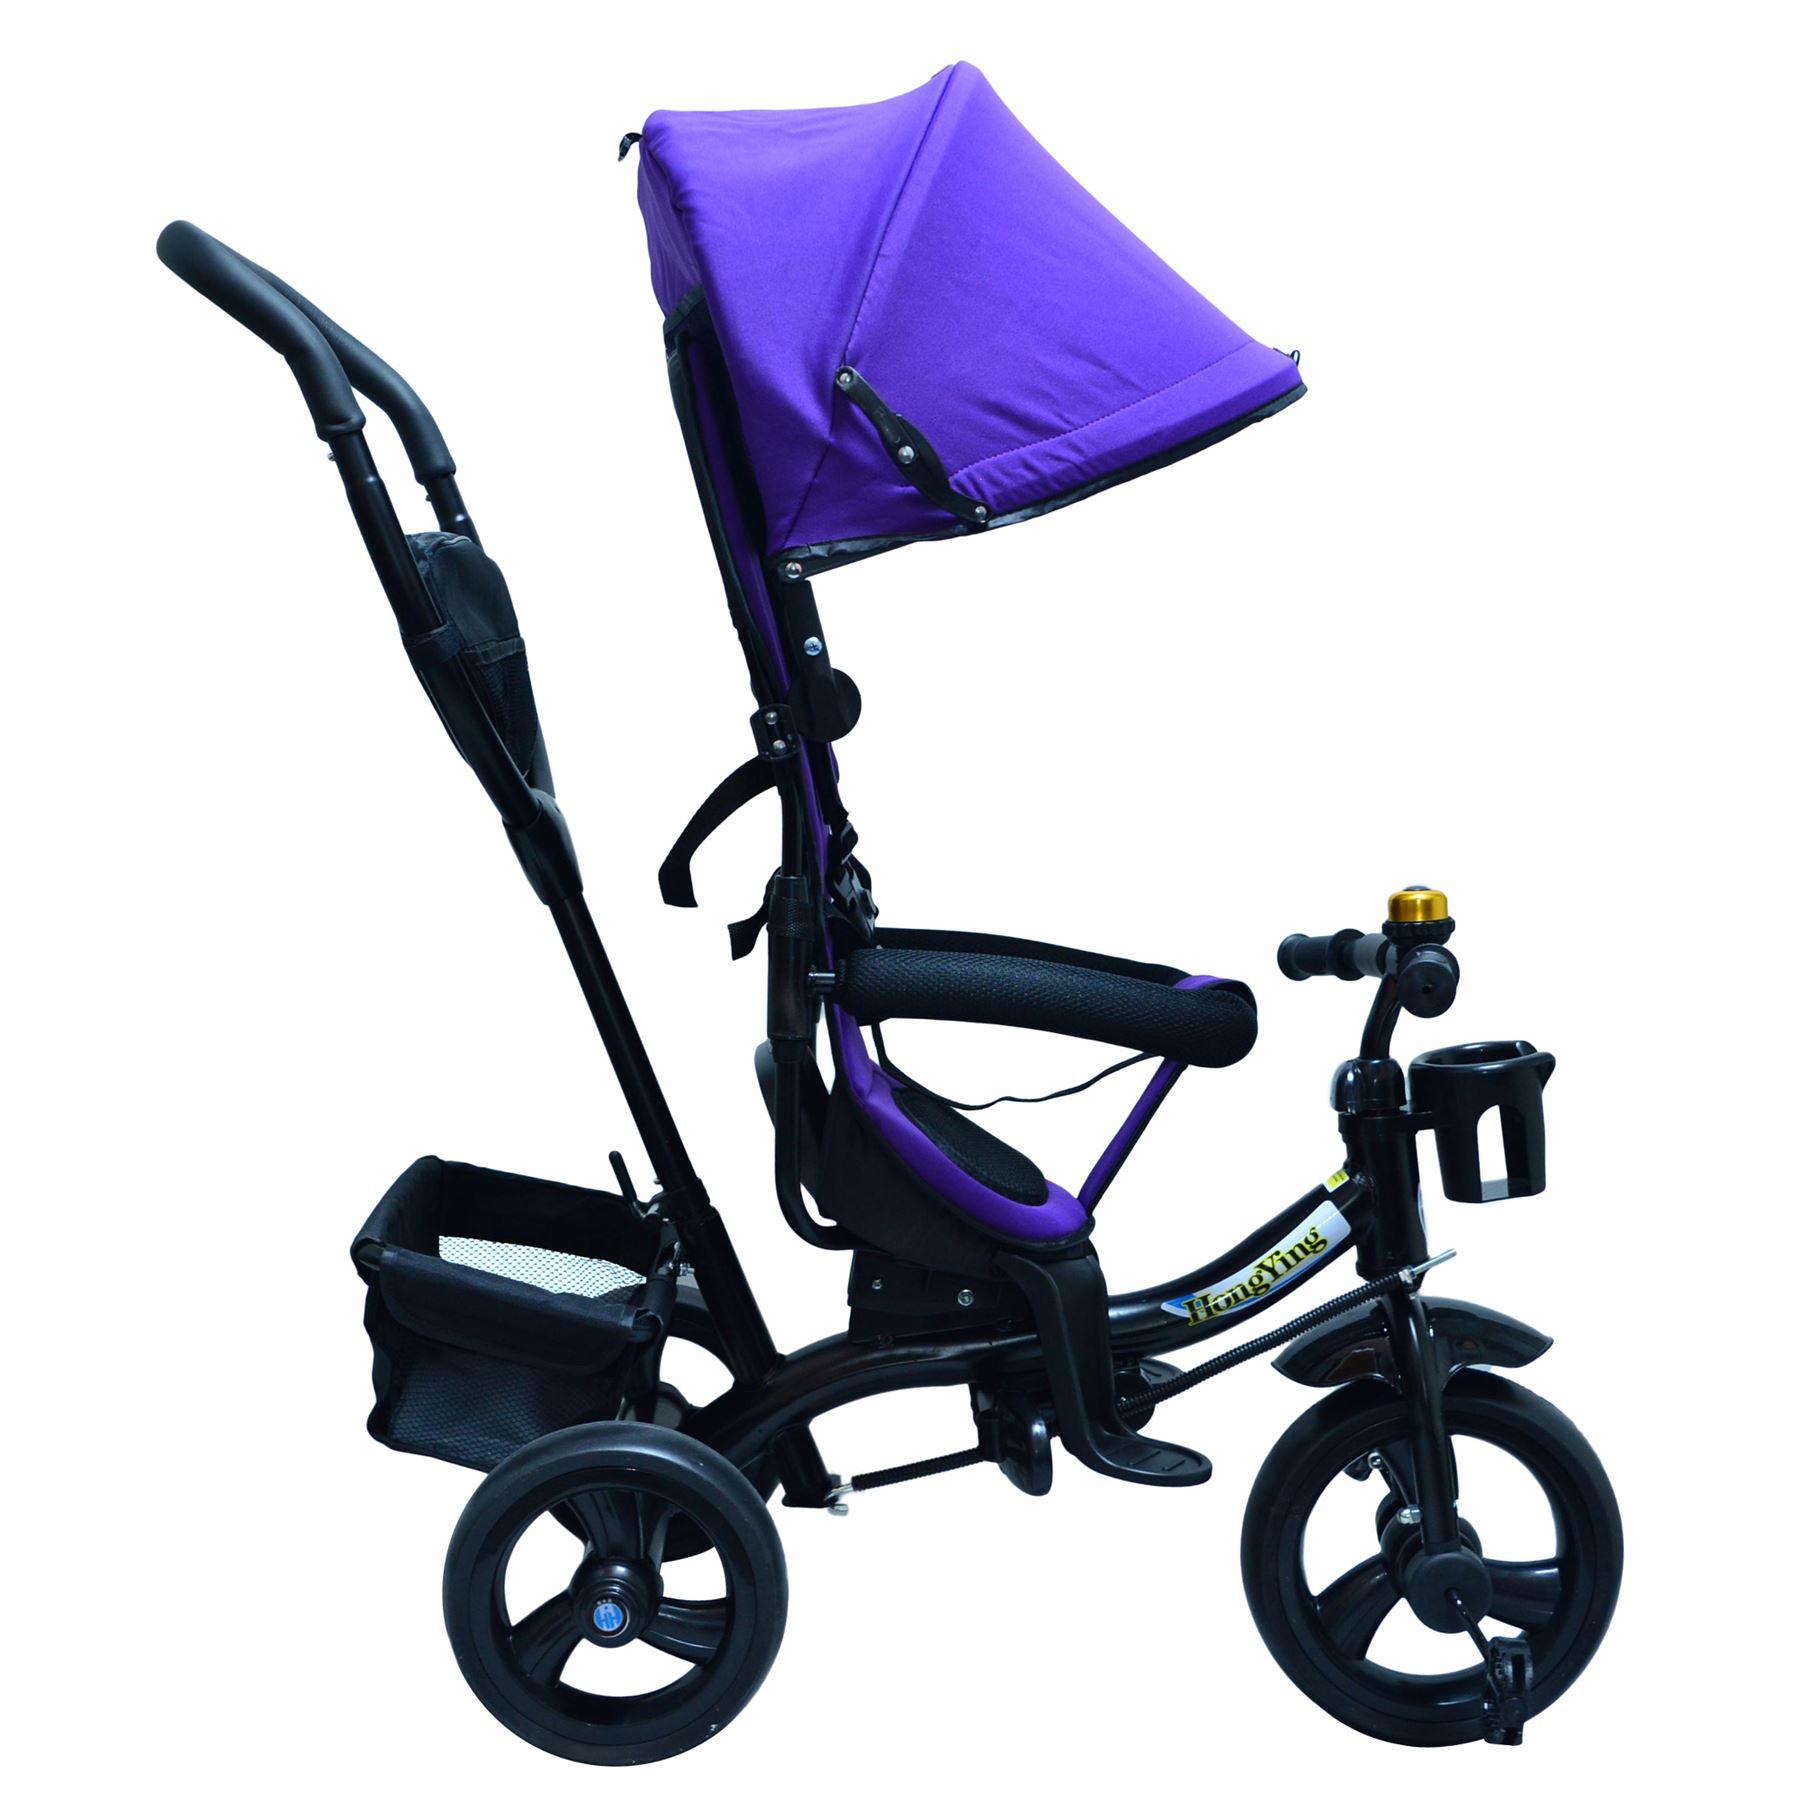 4 In 1 Ride-On Toys Baby Toddler Pram Tricycle Bike Trike ...